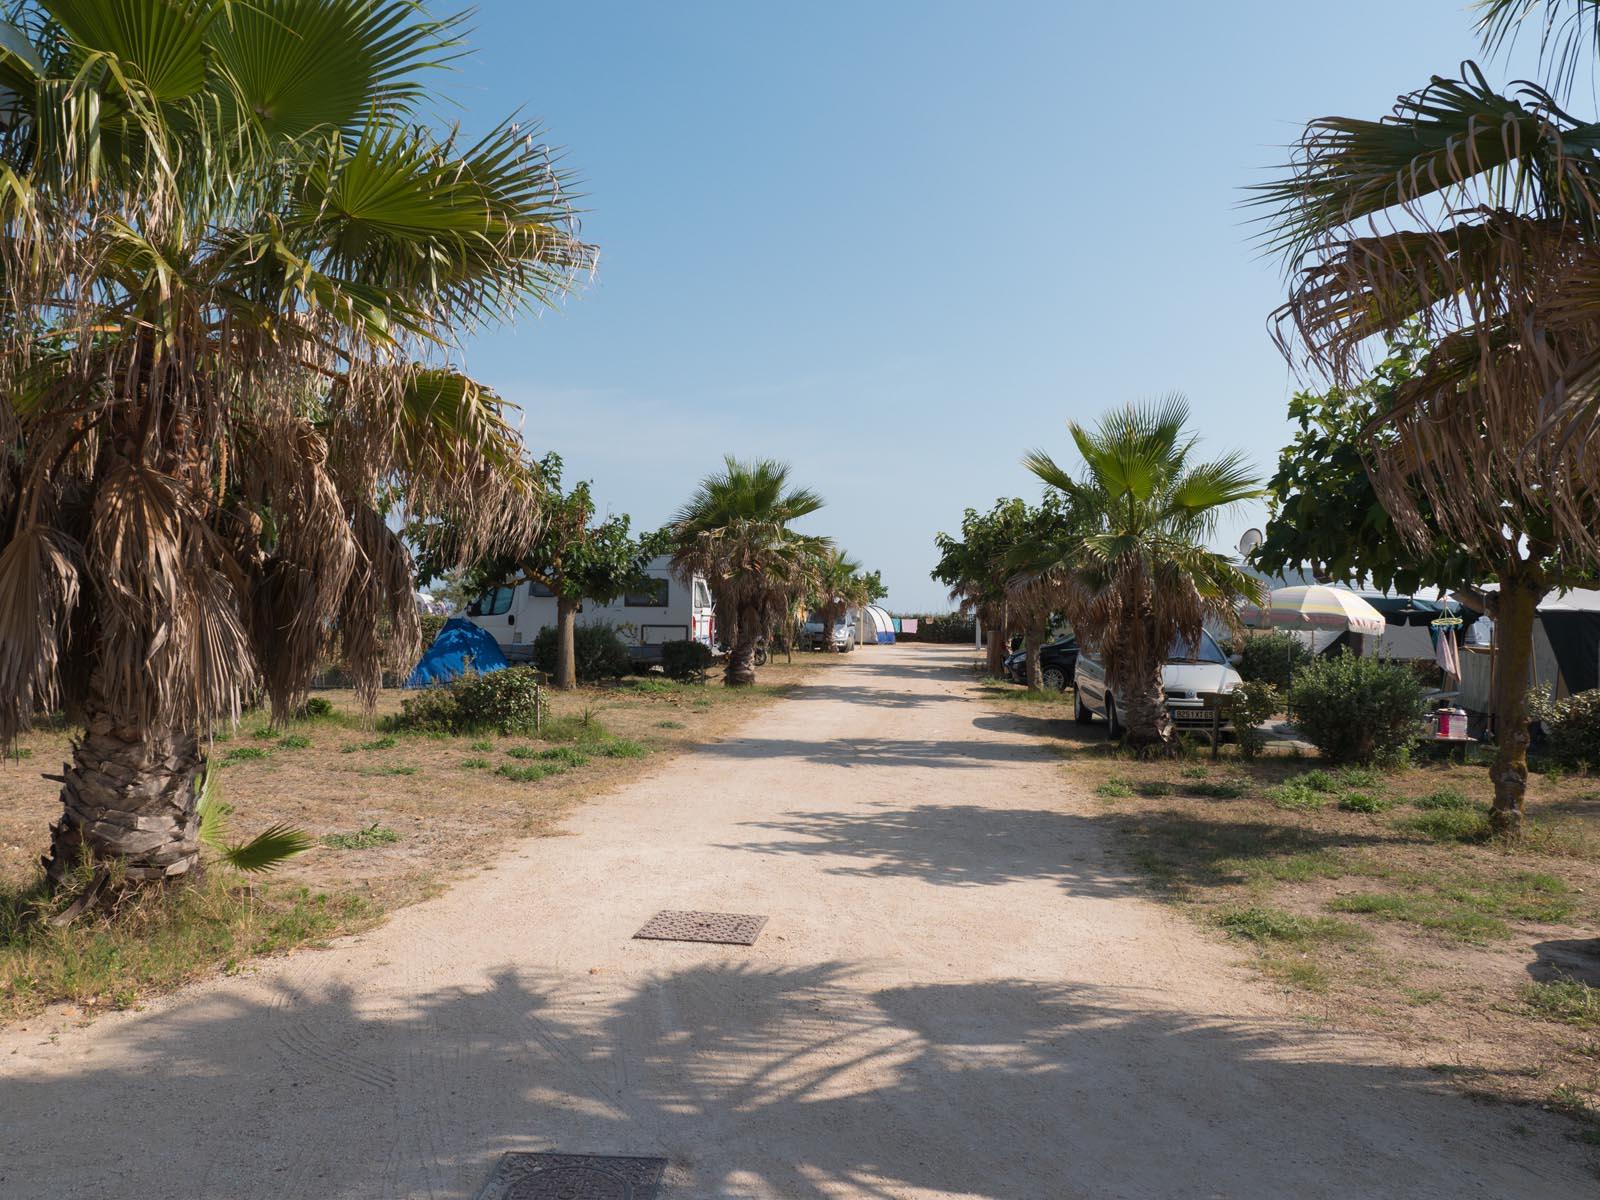 Camping en bord de mer avec palmiers